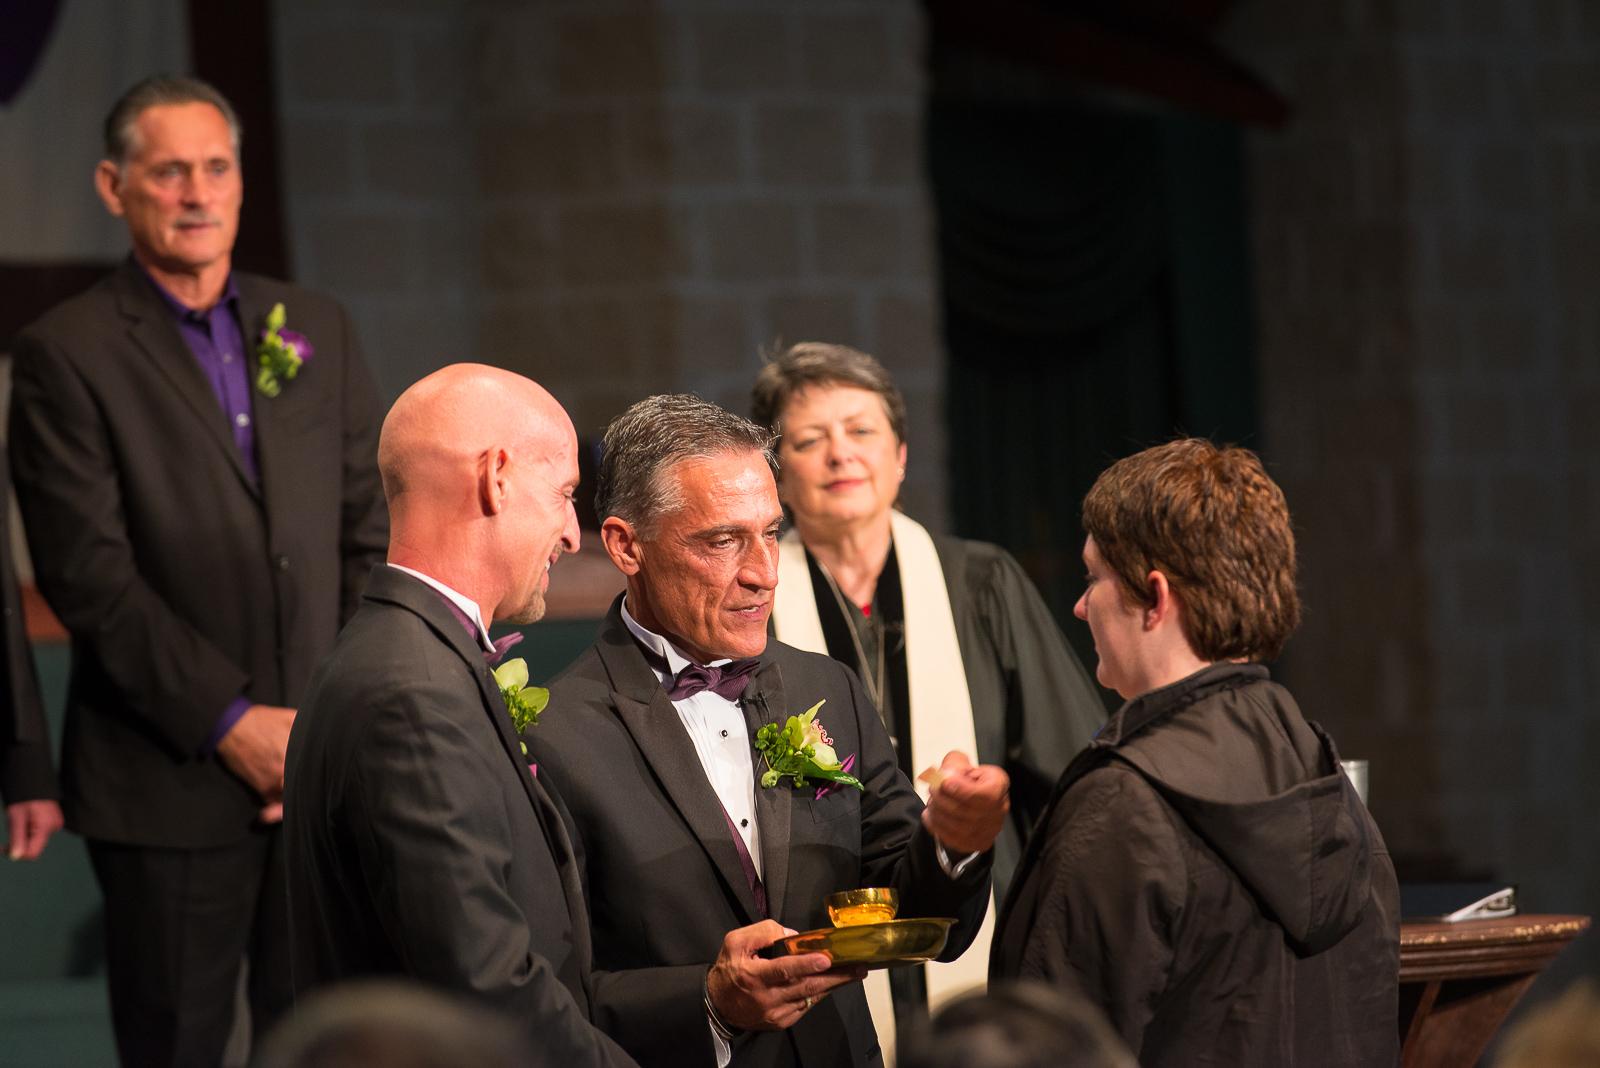 Michael-Napier-Weddings-Ludwig-Guilbeau Wedding-20 (18).jpg